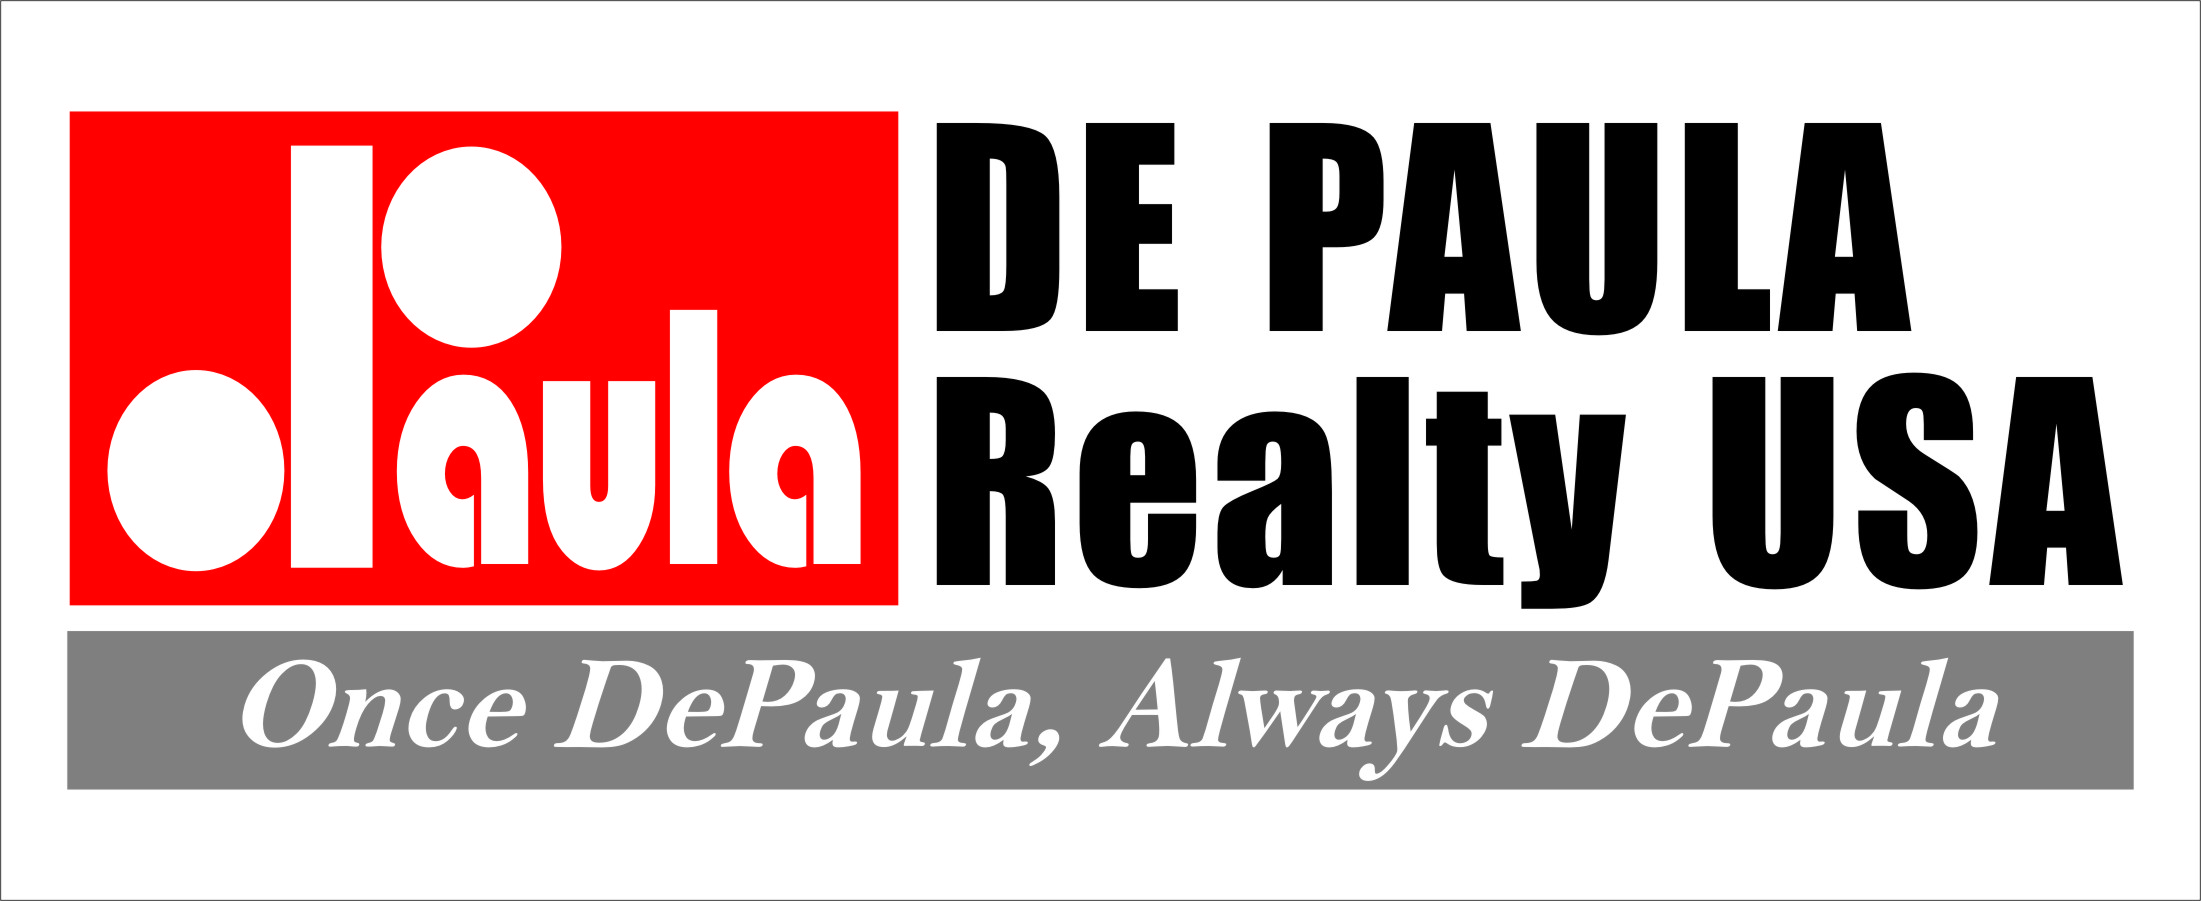 De Paula